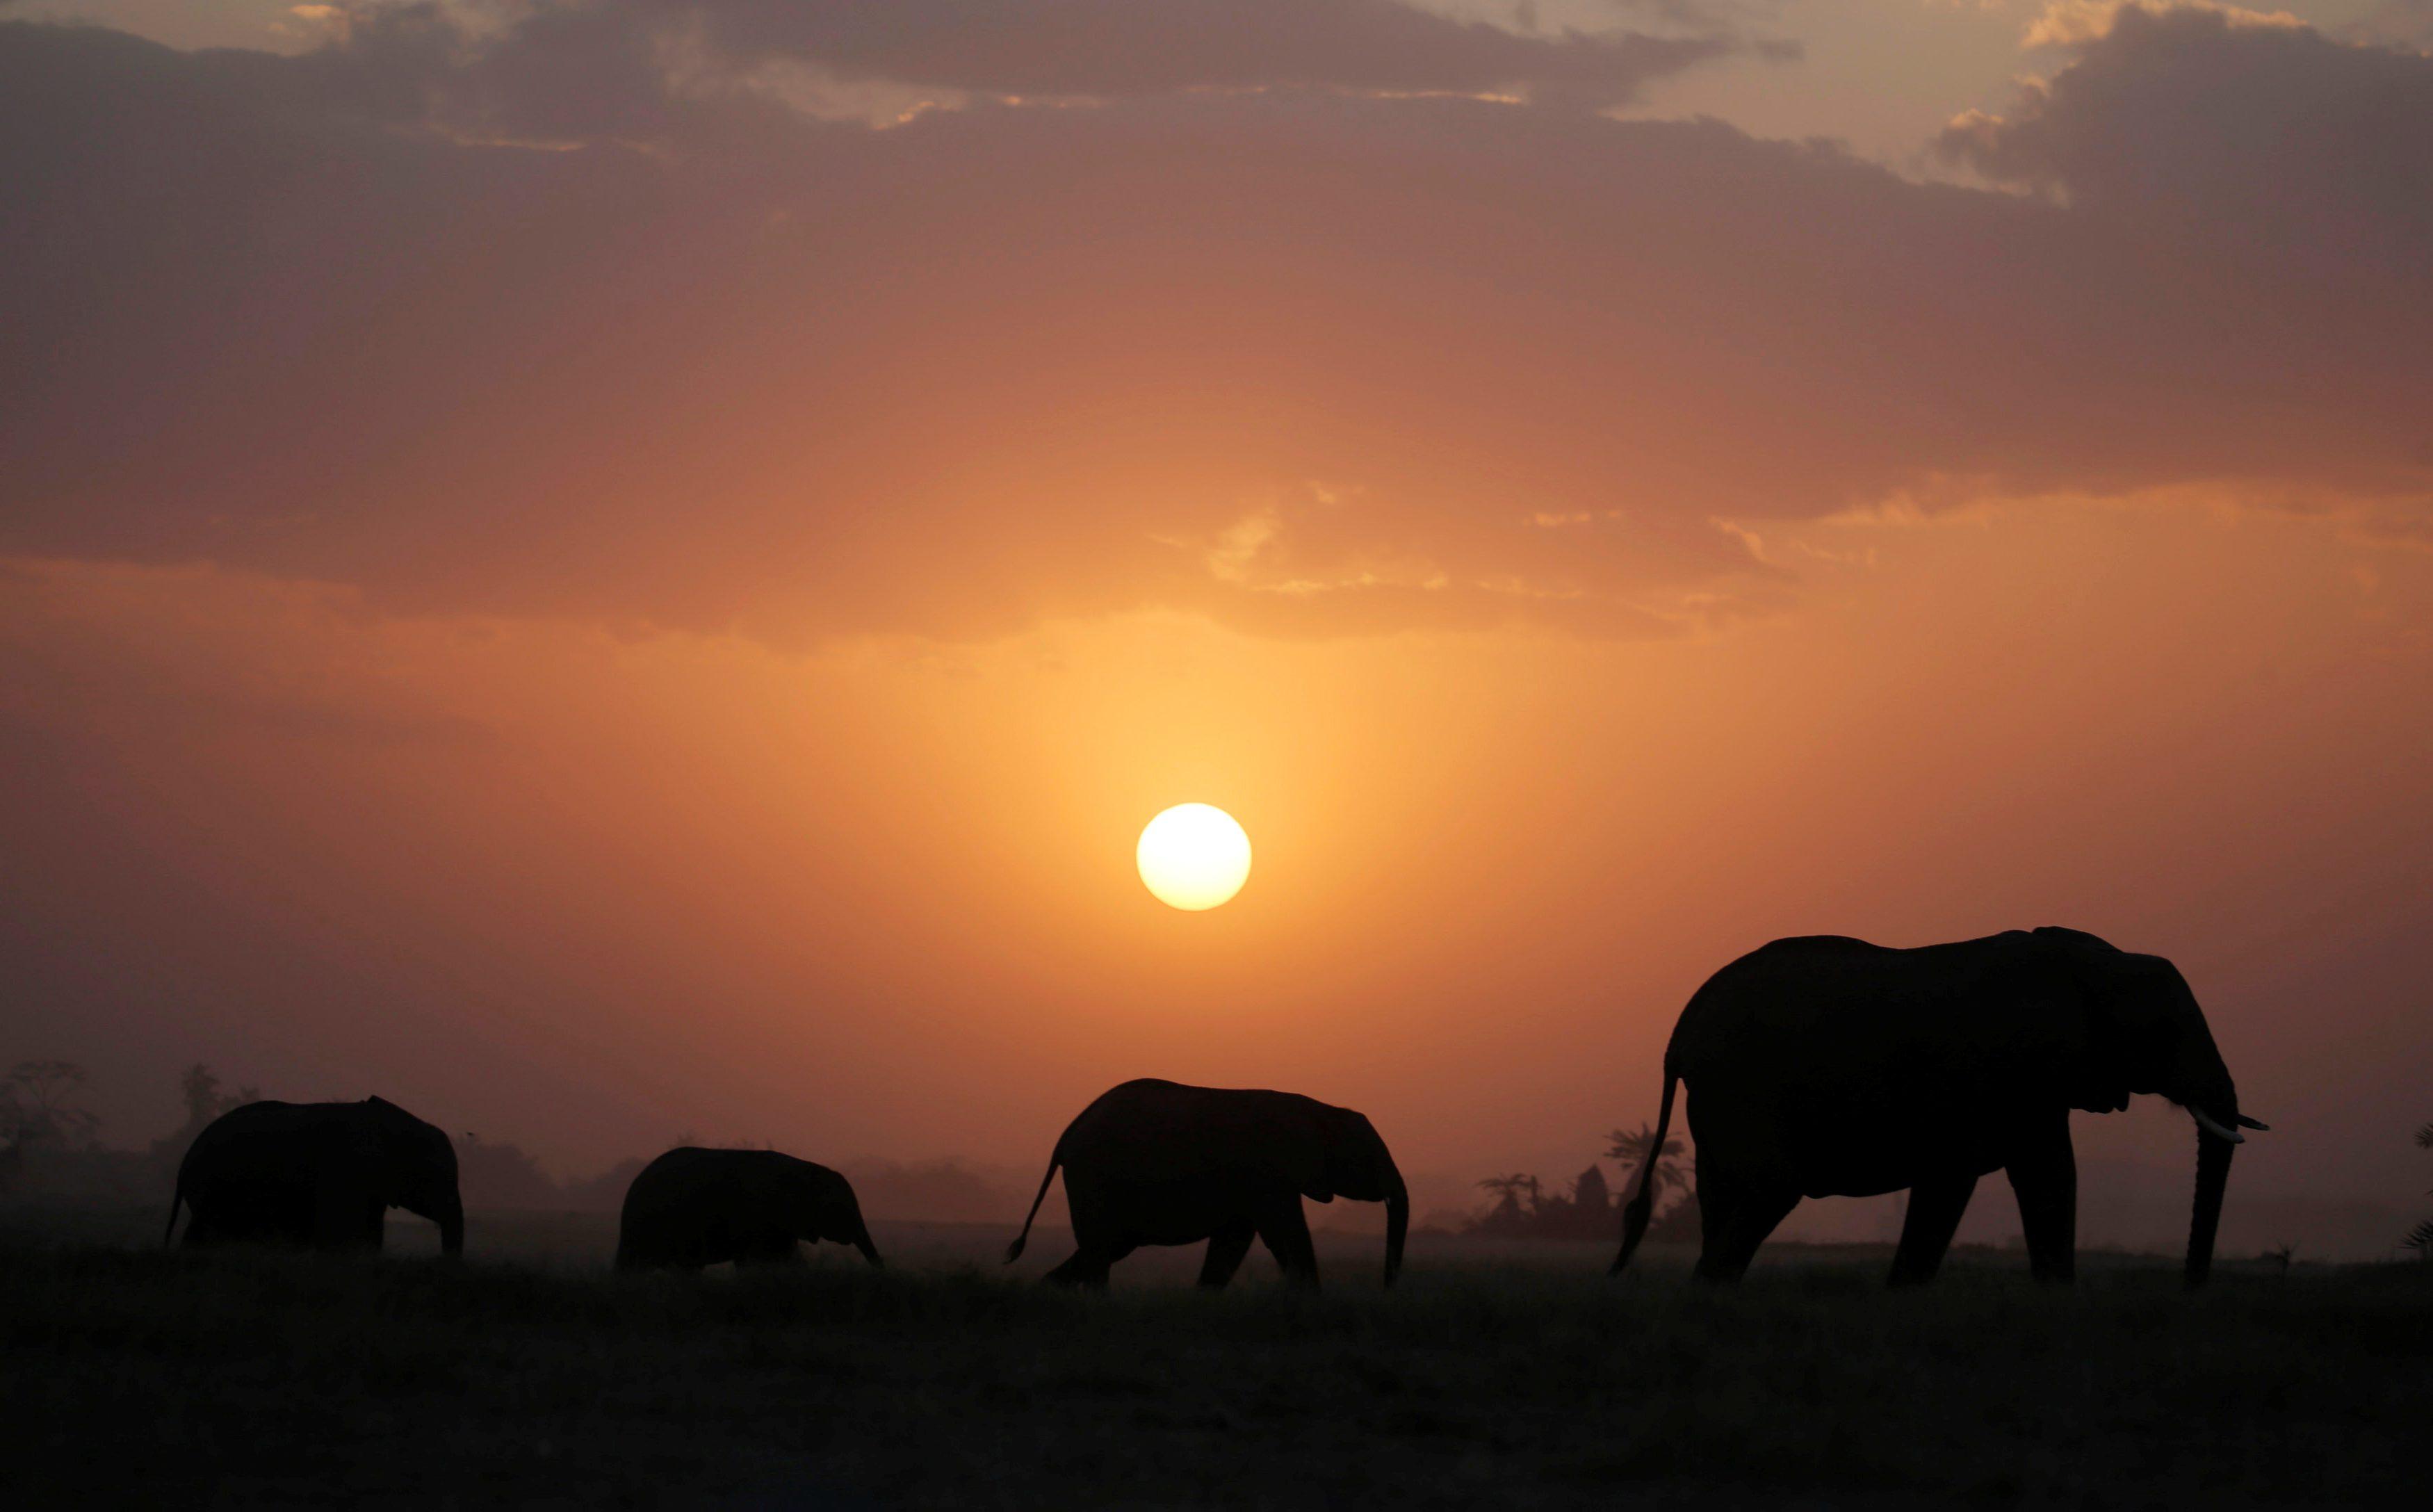 Elephant walk during sunset in Amboseli National park, Kenya August 25, 2016. Picture taken August 25, 2016.  REUTERS/Goran Tomasevic  - S1BETXRBWFAE